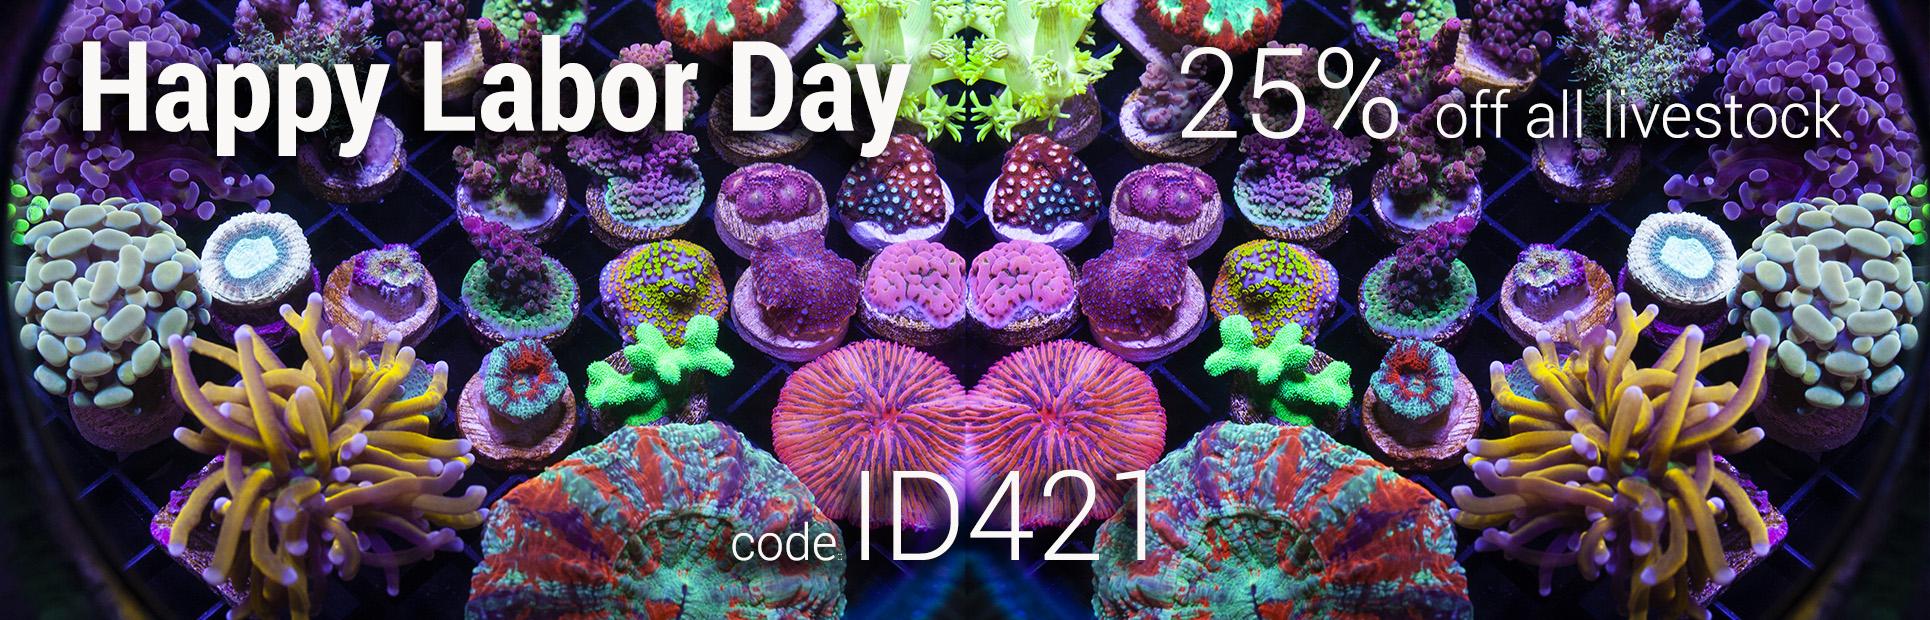 ID421-labor-day-sale.jpg